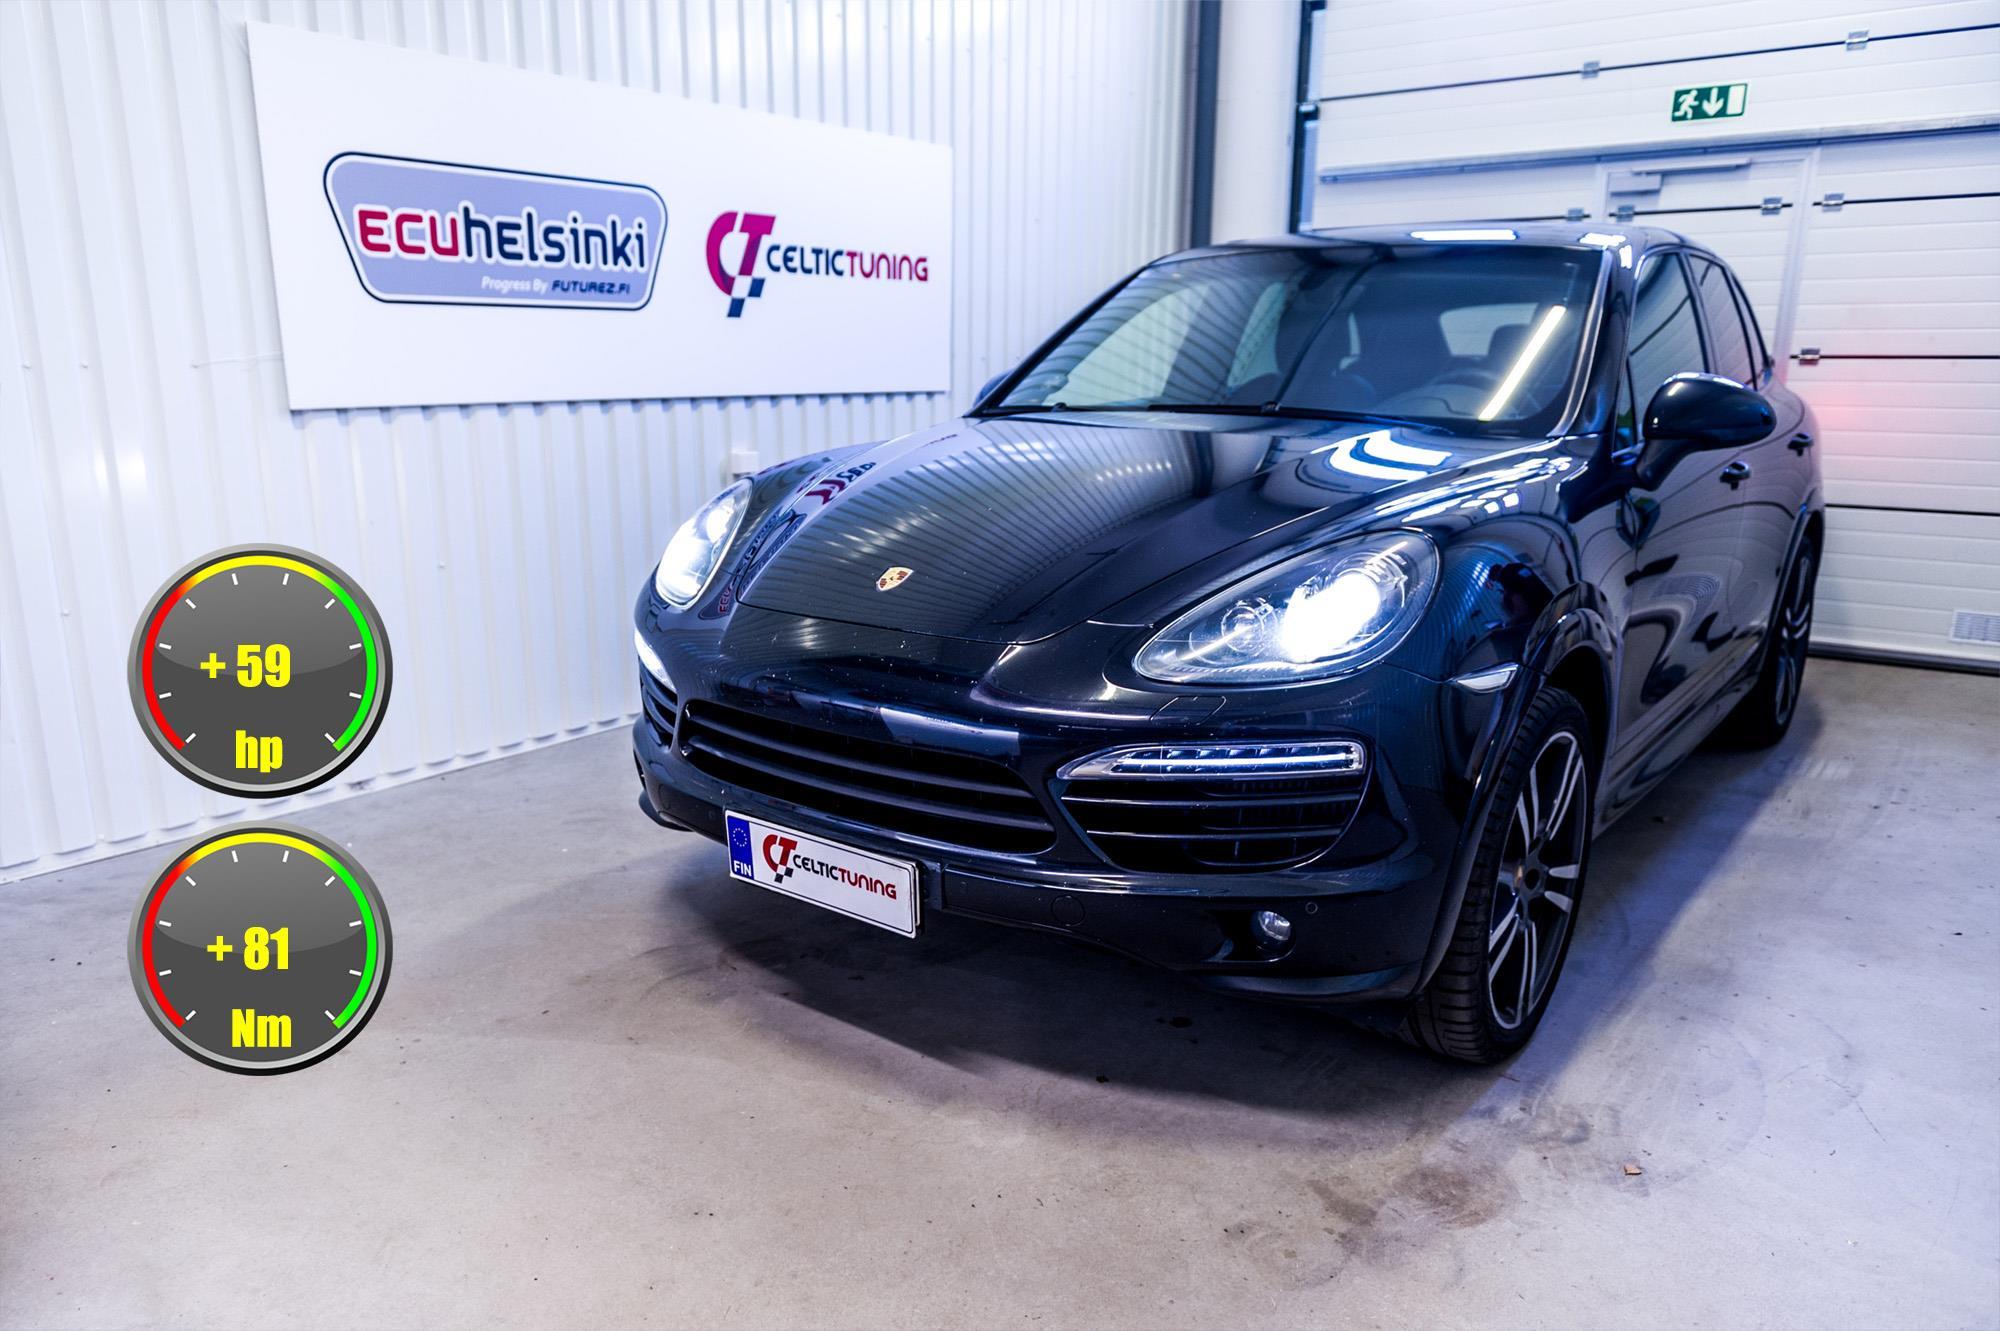 Porsche Cayenne lastutus celtic tuni